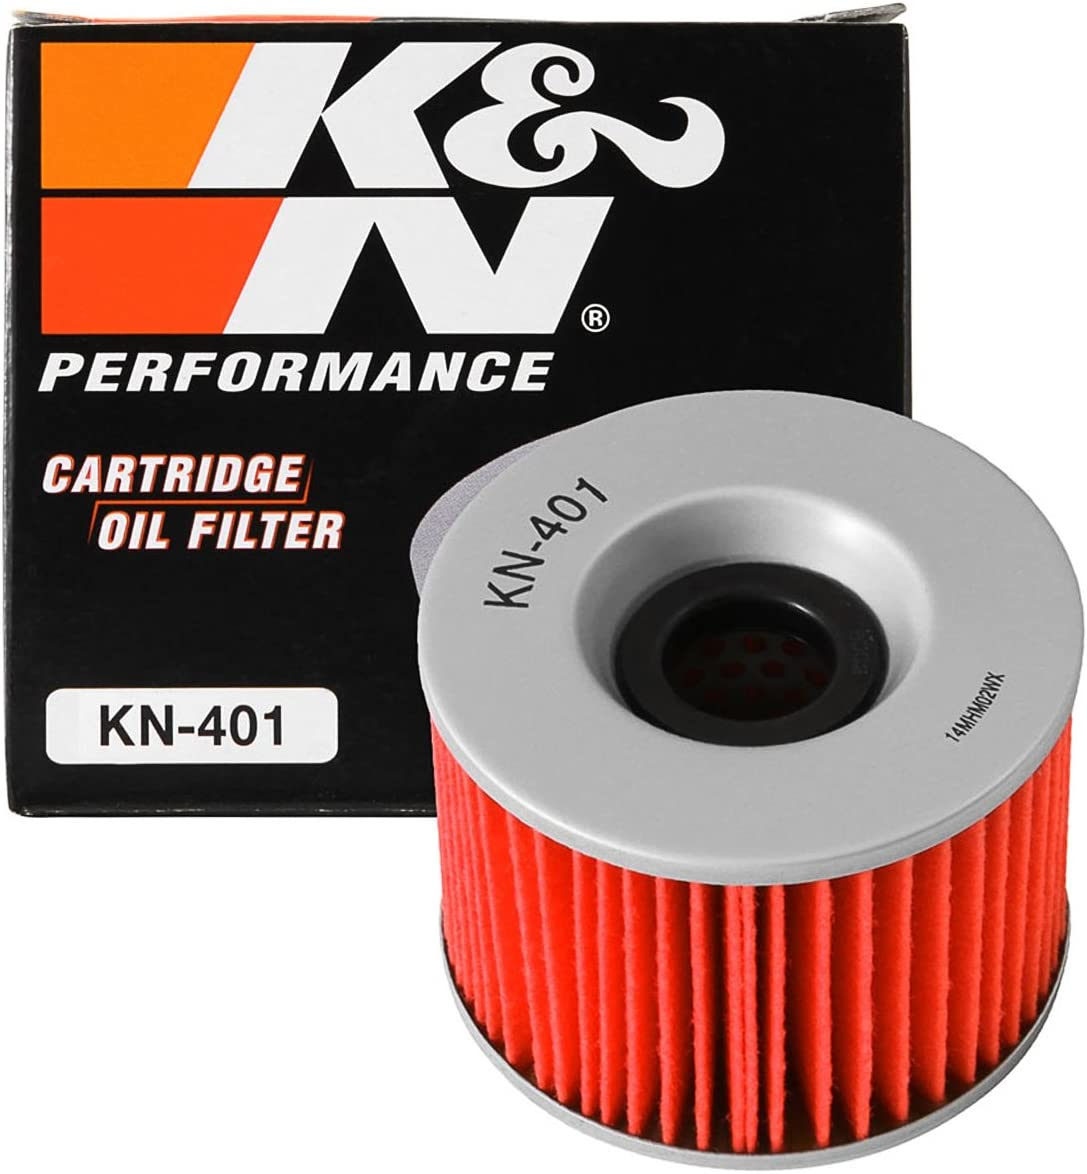 Motul 10w 40 Öl K N Ölfilter Für Yamaha Xjr 1300 Sp Racer Rp02 Rp06 Rp10 Rp19 Ölwechselset Inkl Motoröl Filter Dichtring Auto